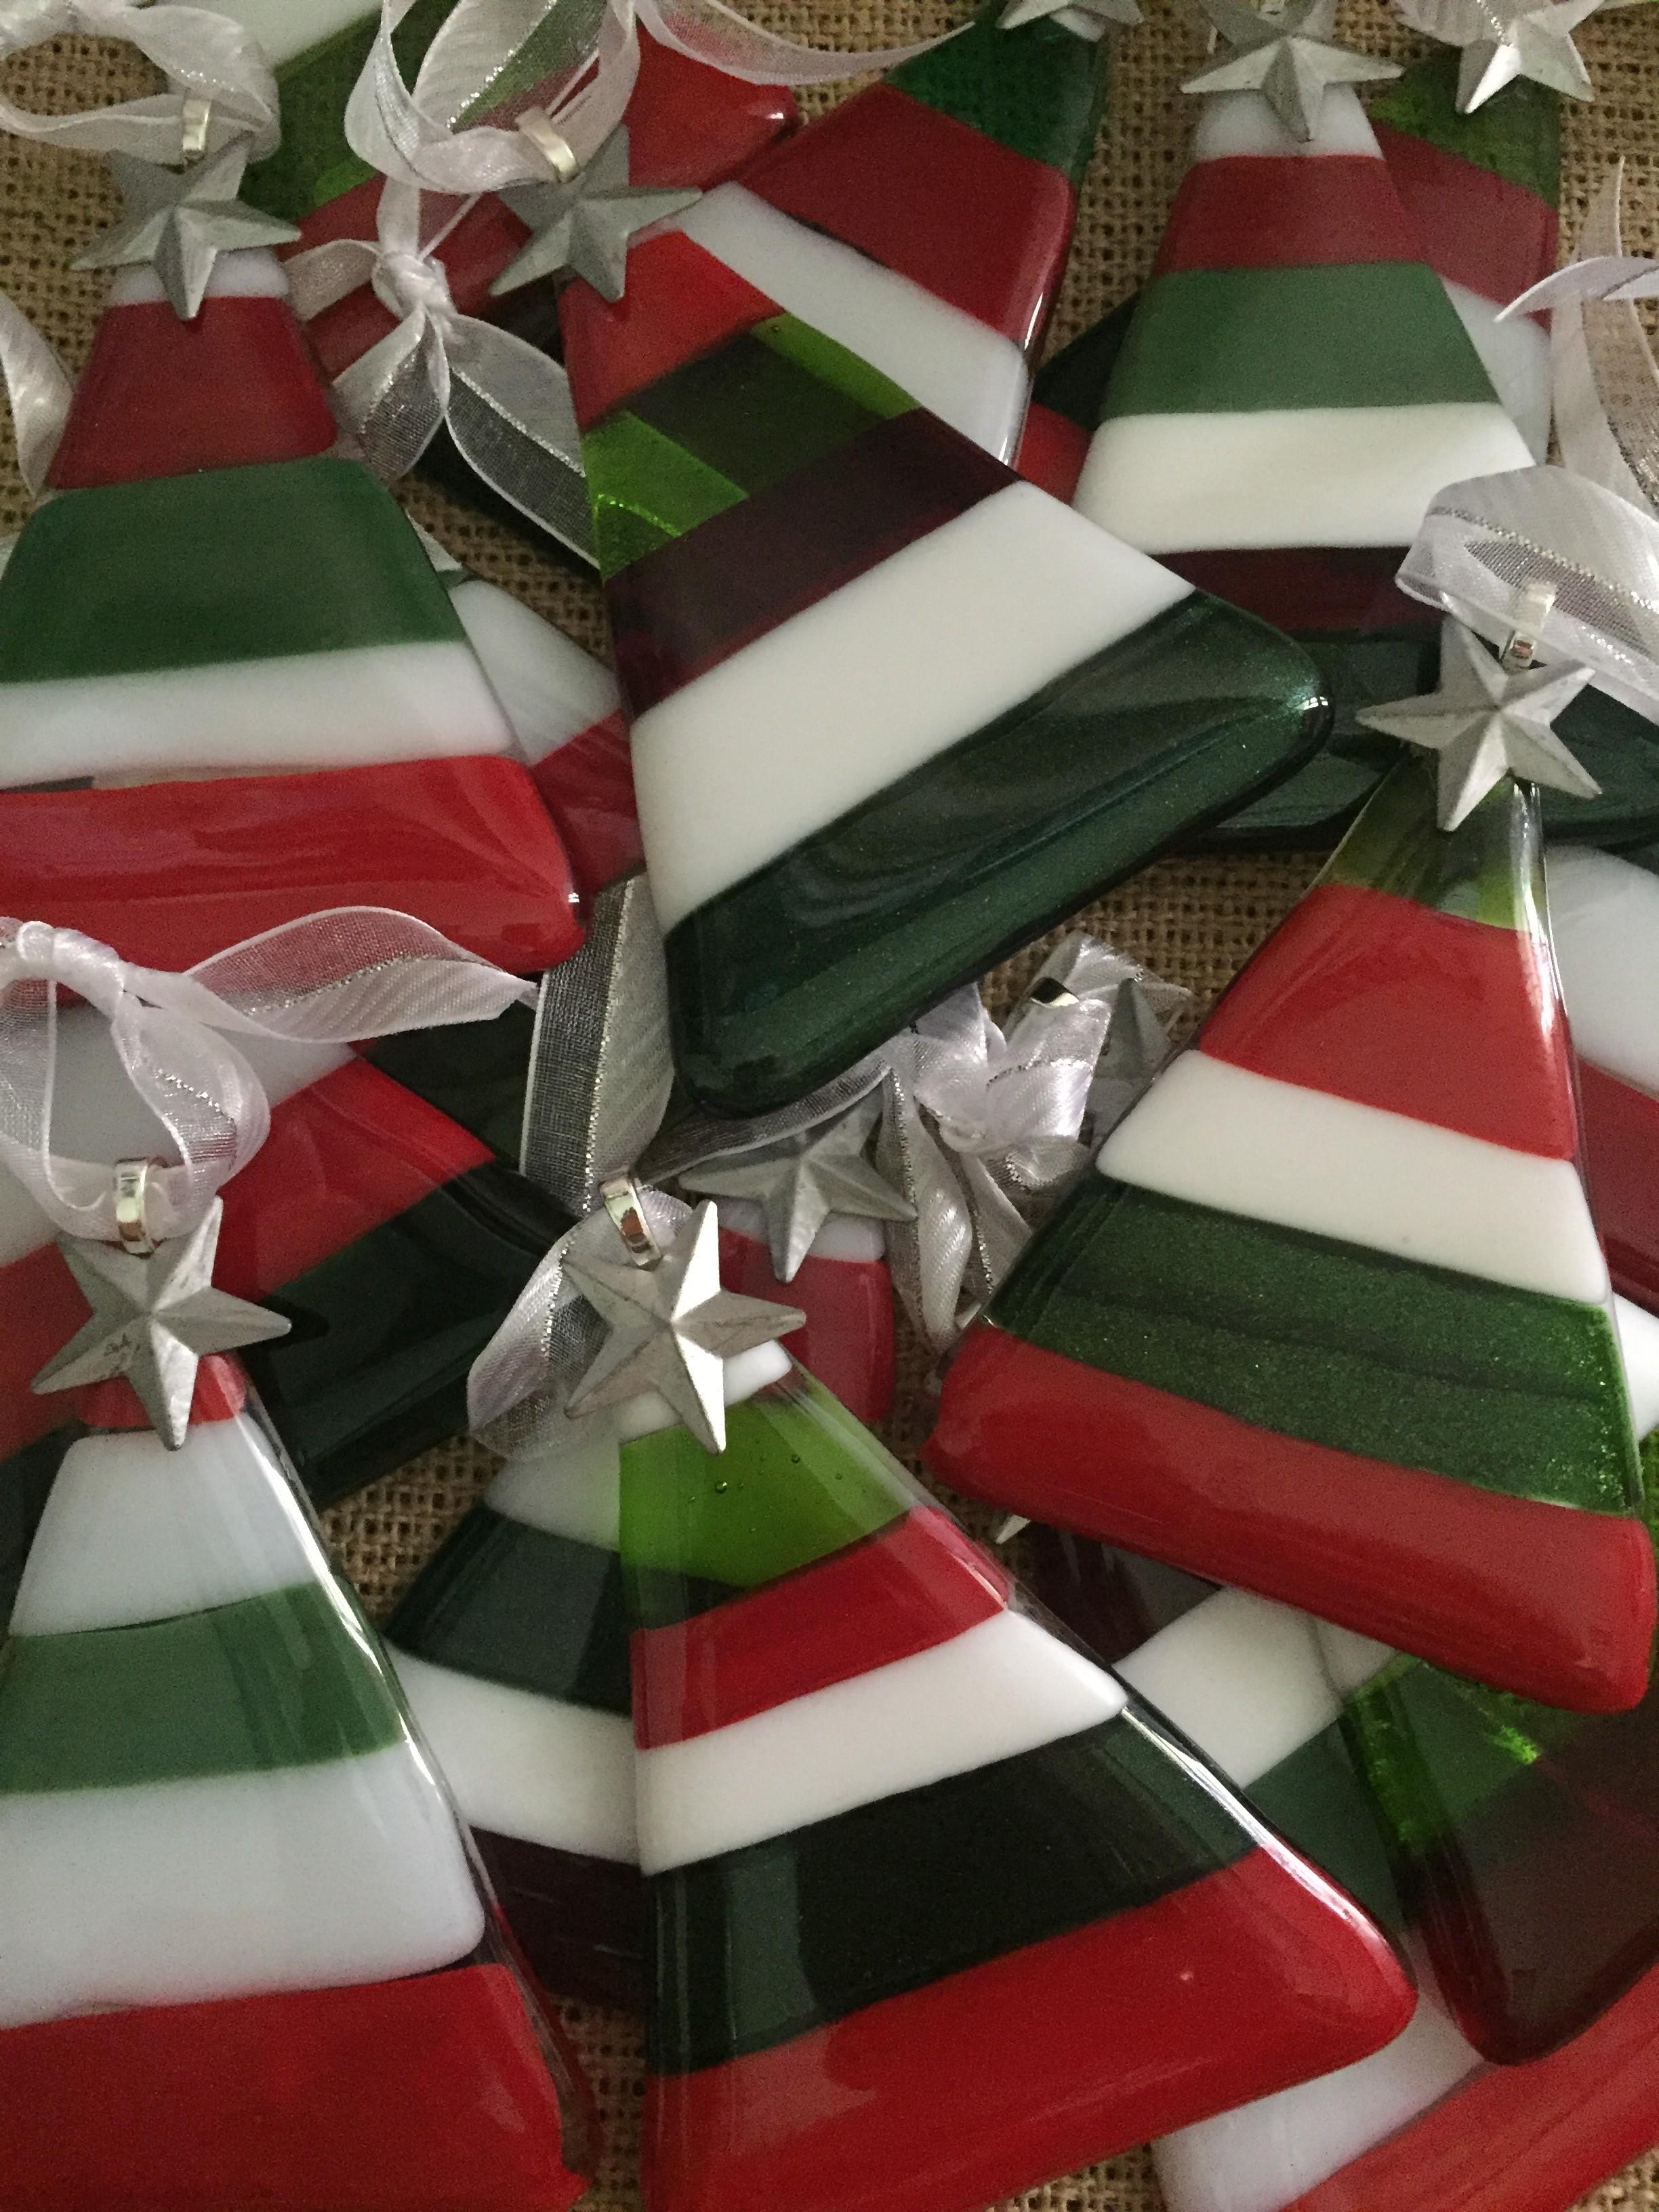 2018 Christmas Tree Ornament.jpg